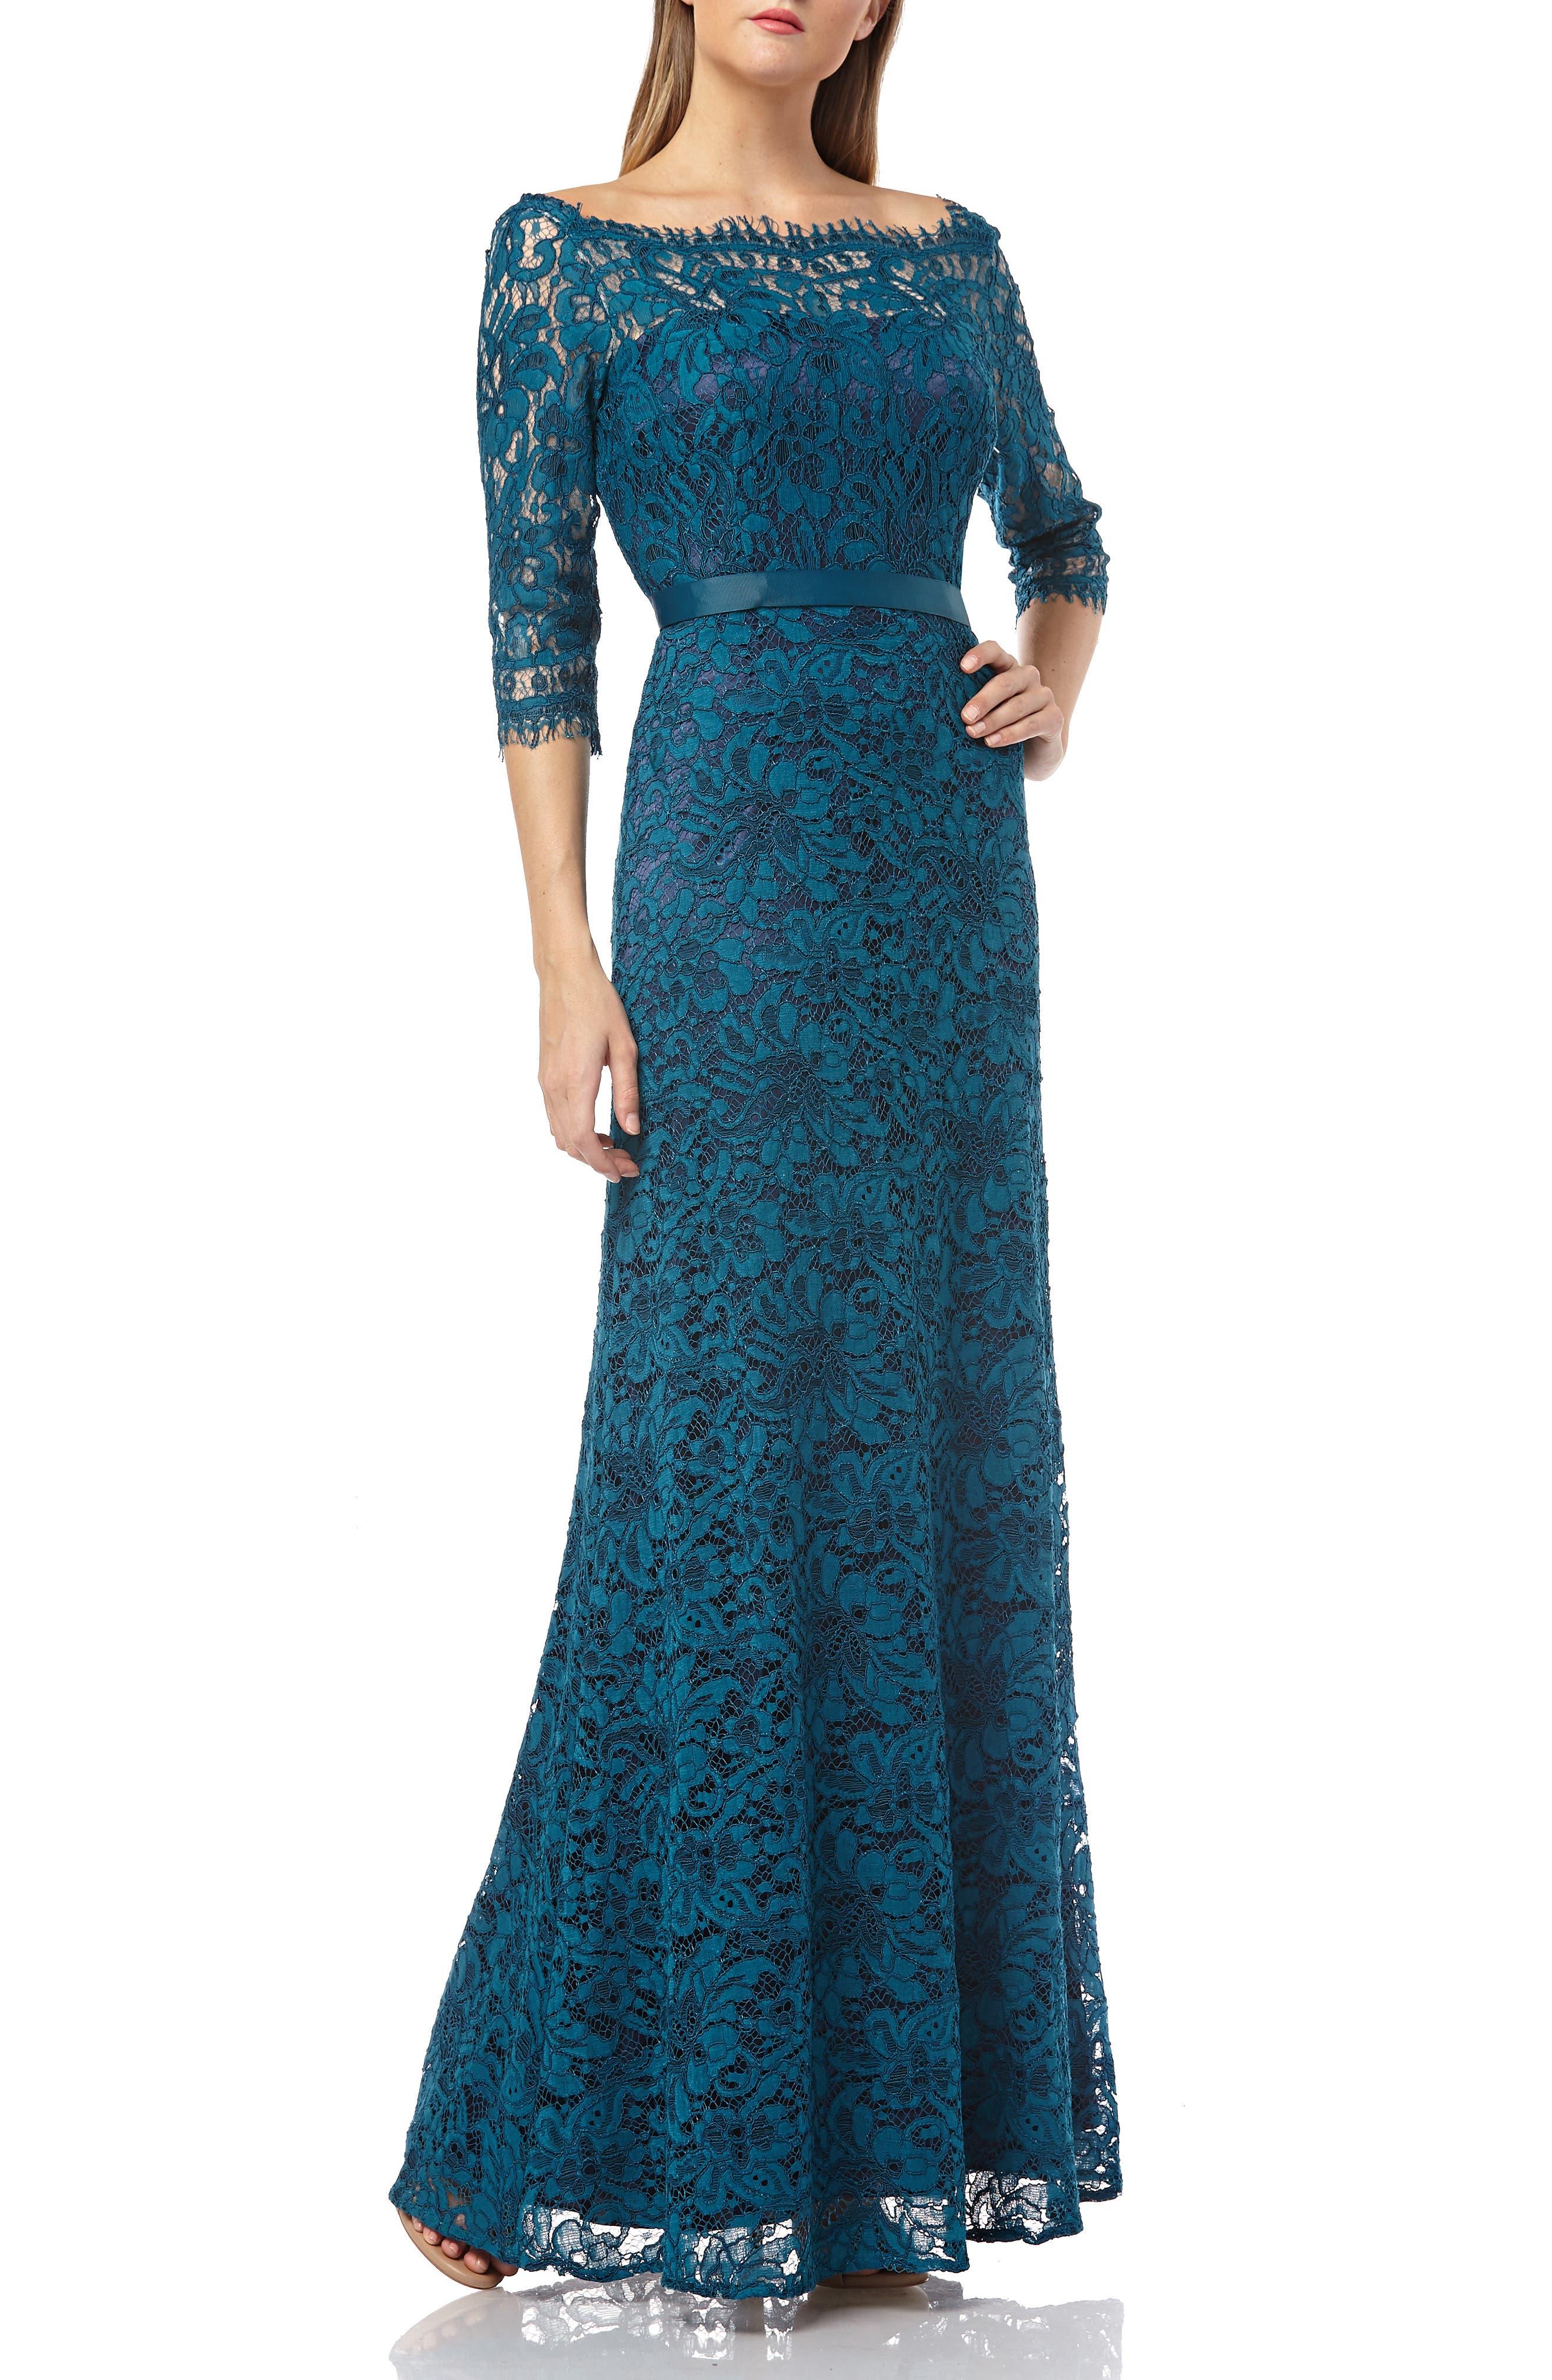 JS COLLECTIONS,                             Bateau Neck Lace Gown,                             Main thumbnail 1, color,                             TURQOISE NAVY